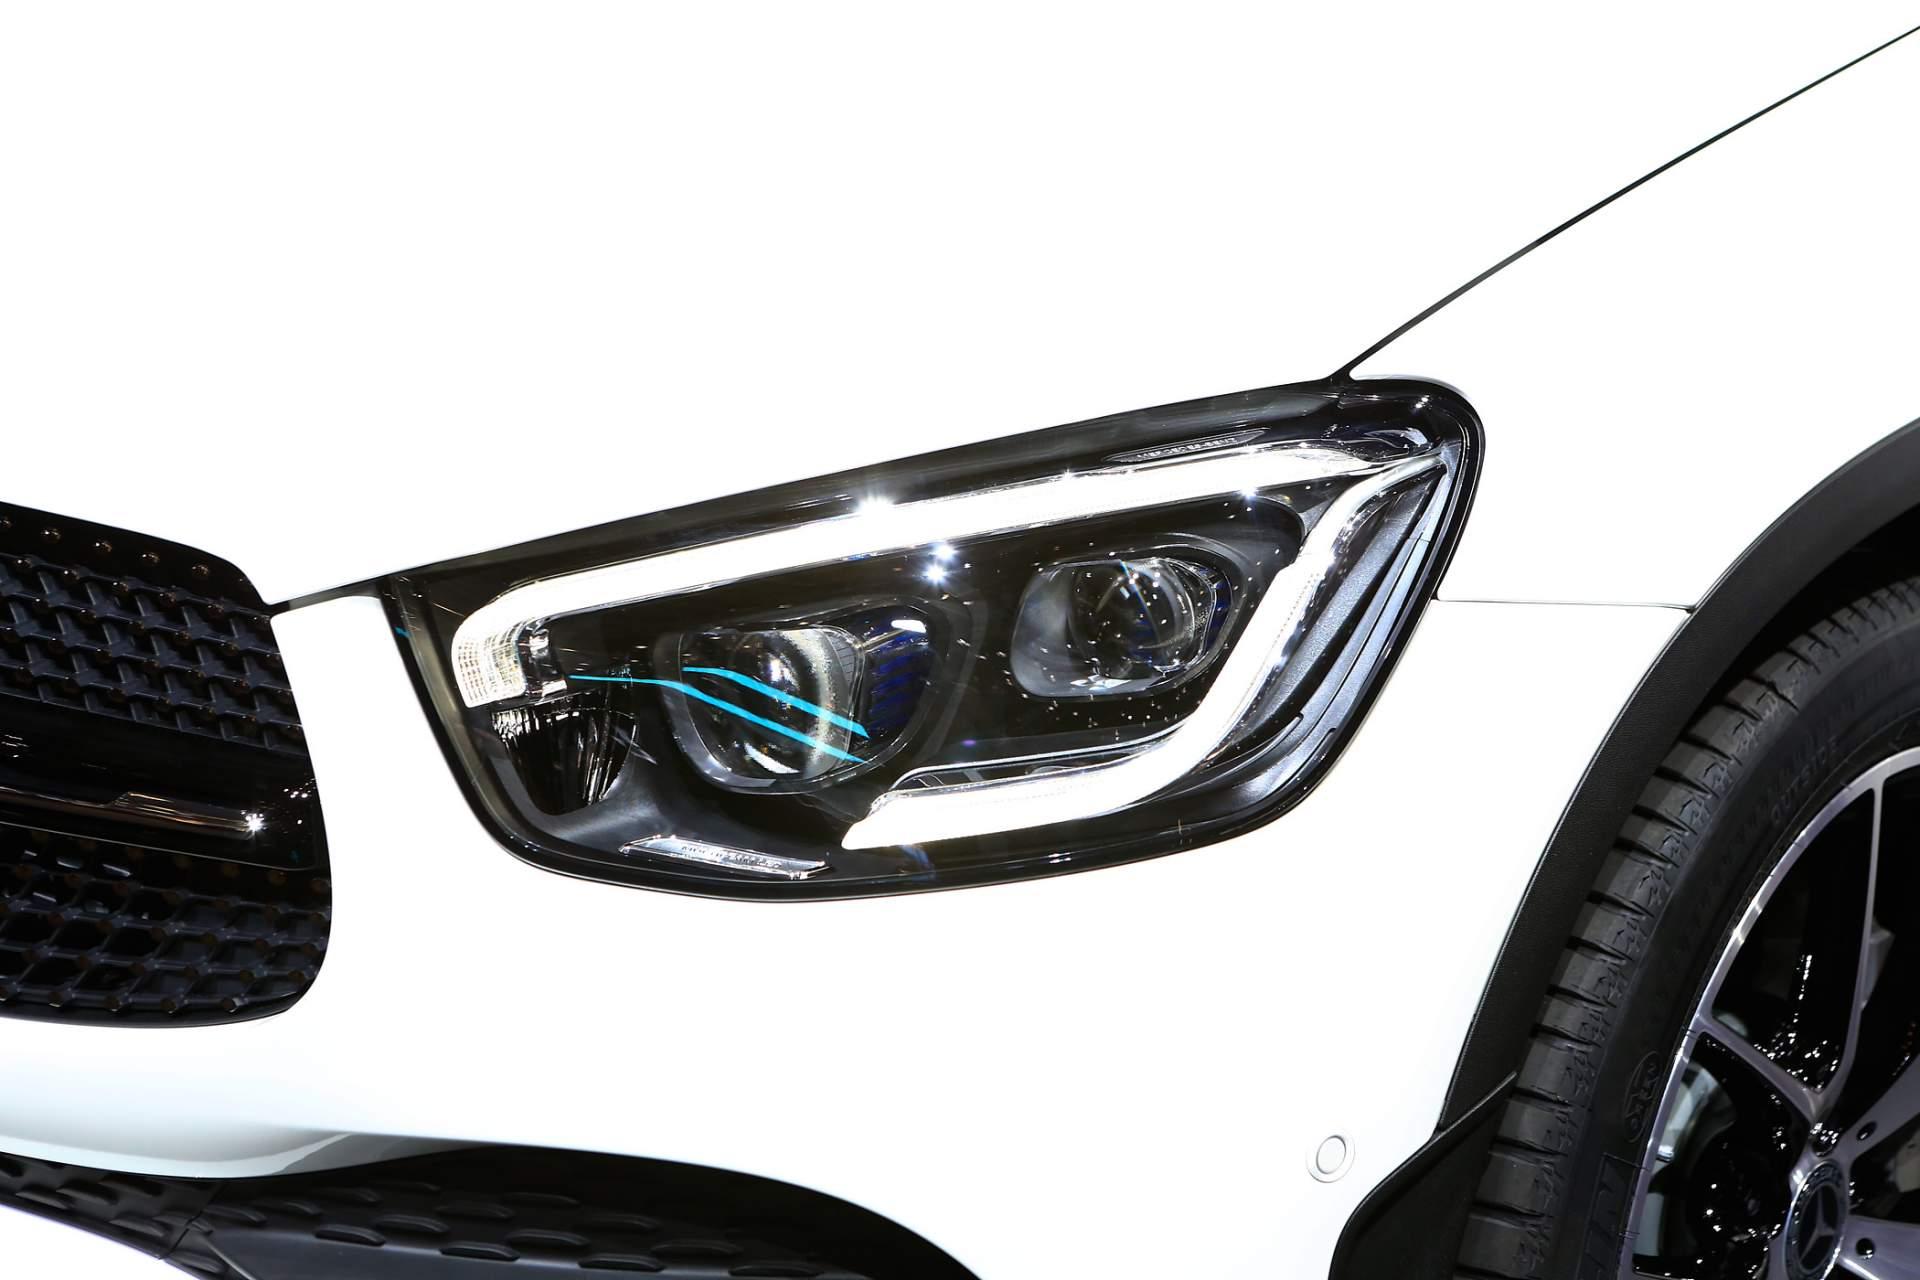 mercedes-benz-glc-2020a2840d74-mercedes-benz-glc-facelift-at-2019-geneva-motor-show-3.jpg